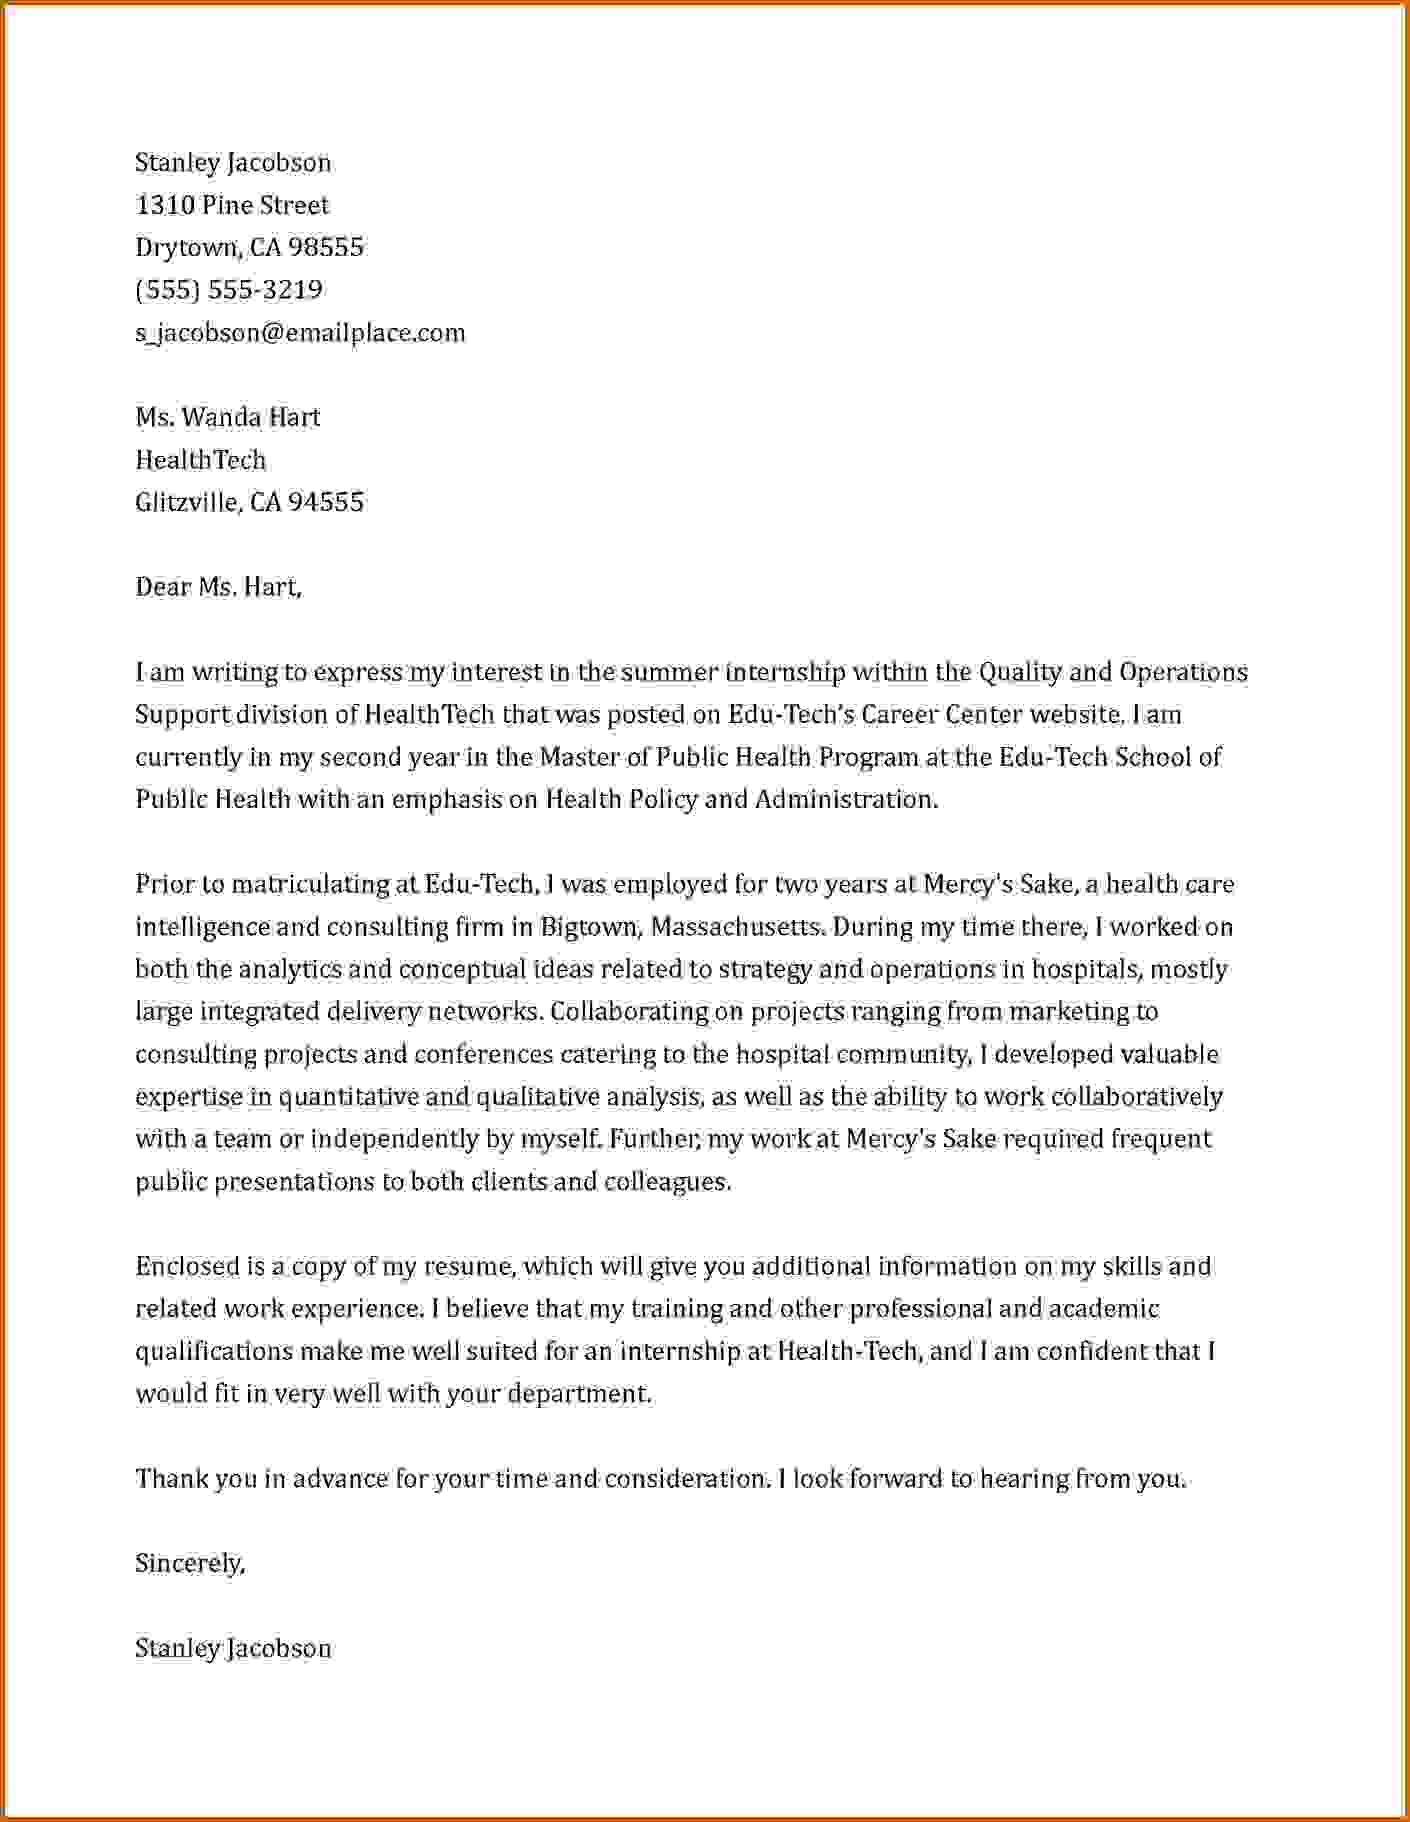 Cover Letter For Summer Internship 8 Internship Cover Letter Sle Lease Template #studymathonine  Math .